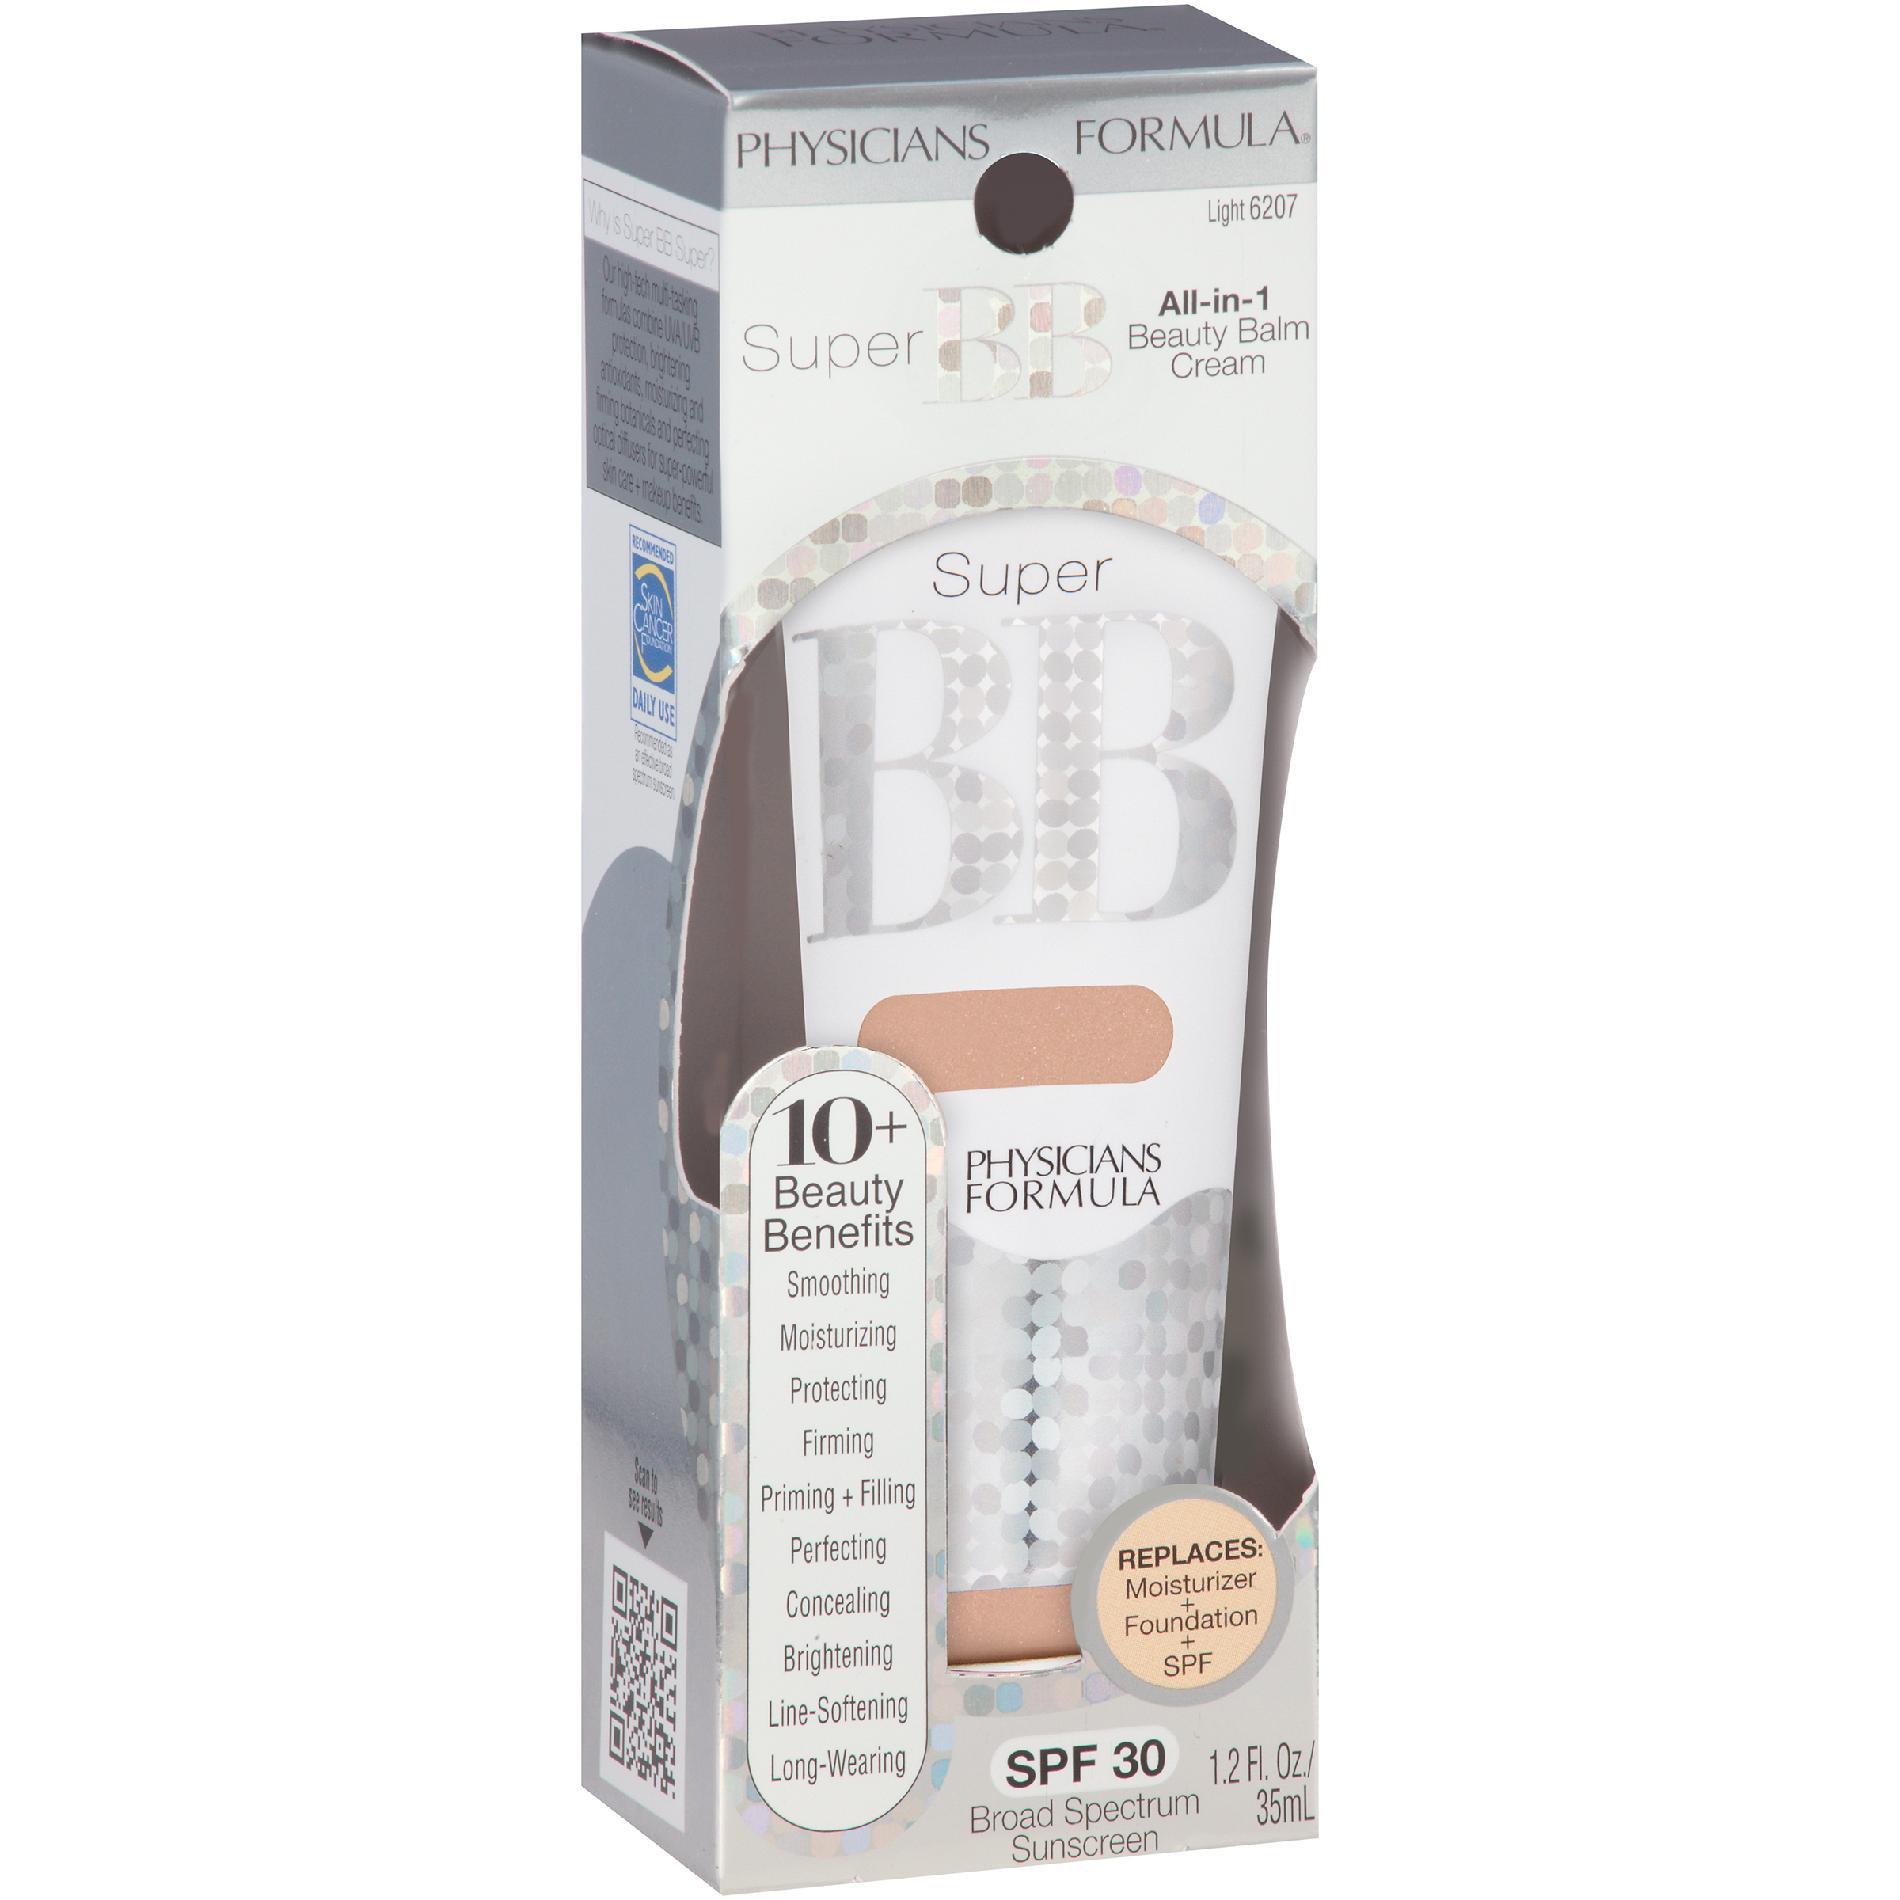 Physicians Formula Beauty Balm Cream, All-in-1, SPF 30, Light 6207, 1.2 fl oz (35 ml)